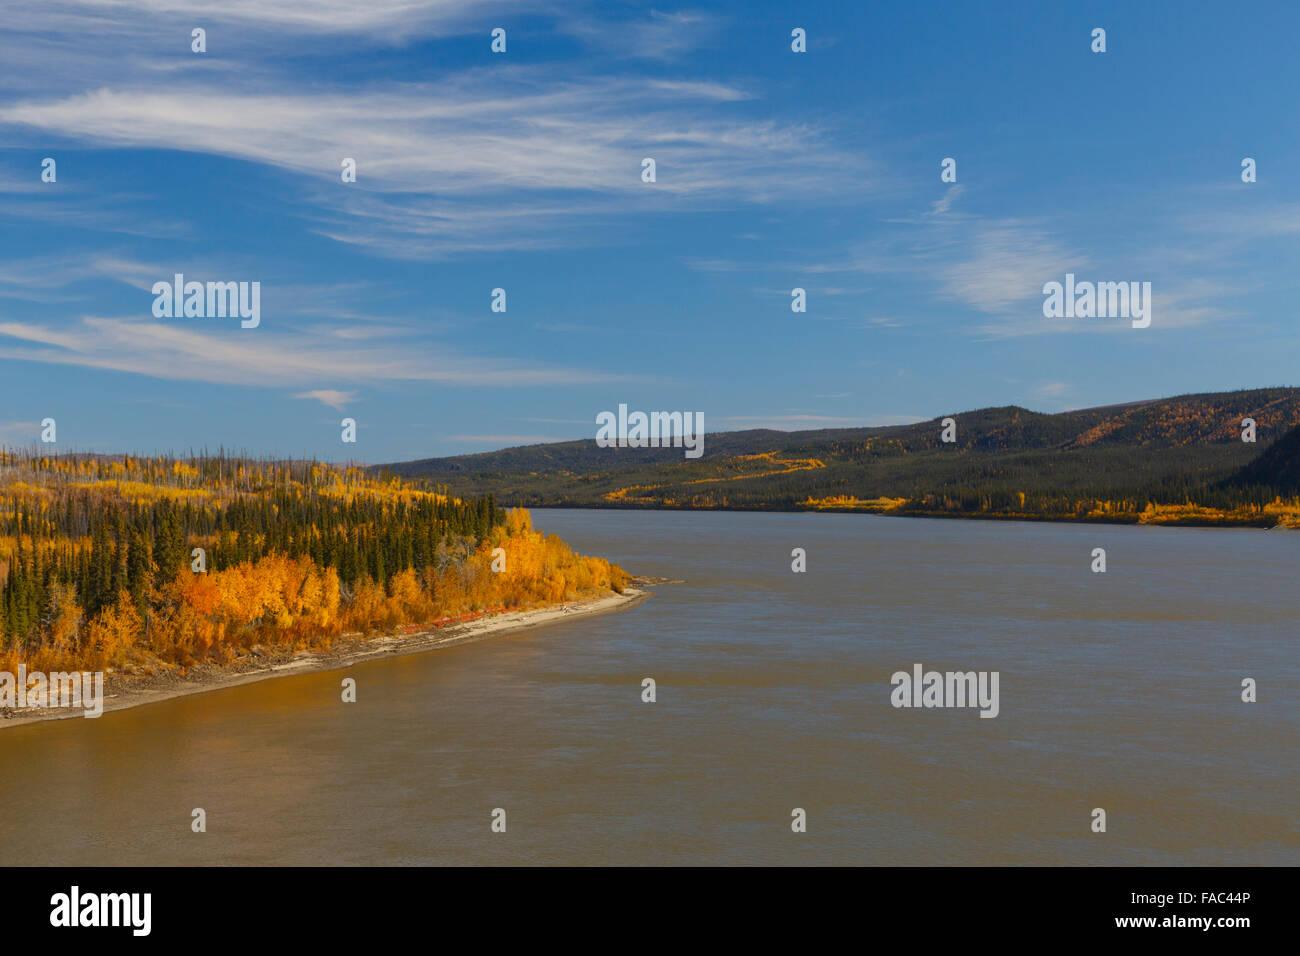 Autumn along the Yukon River from the Dalton Highway bridge, Alaska. - Stock Image